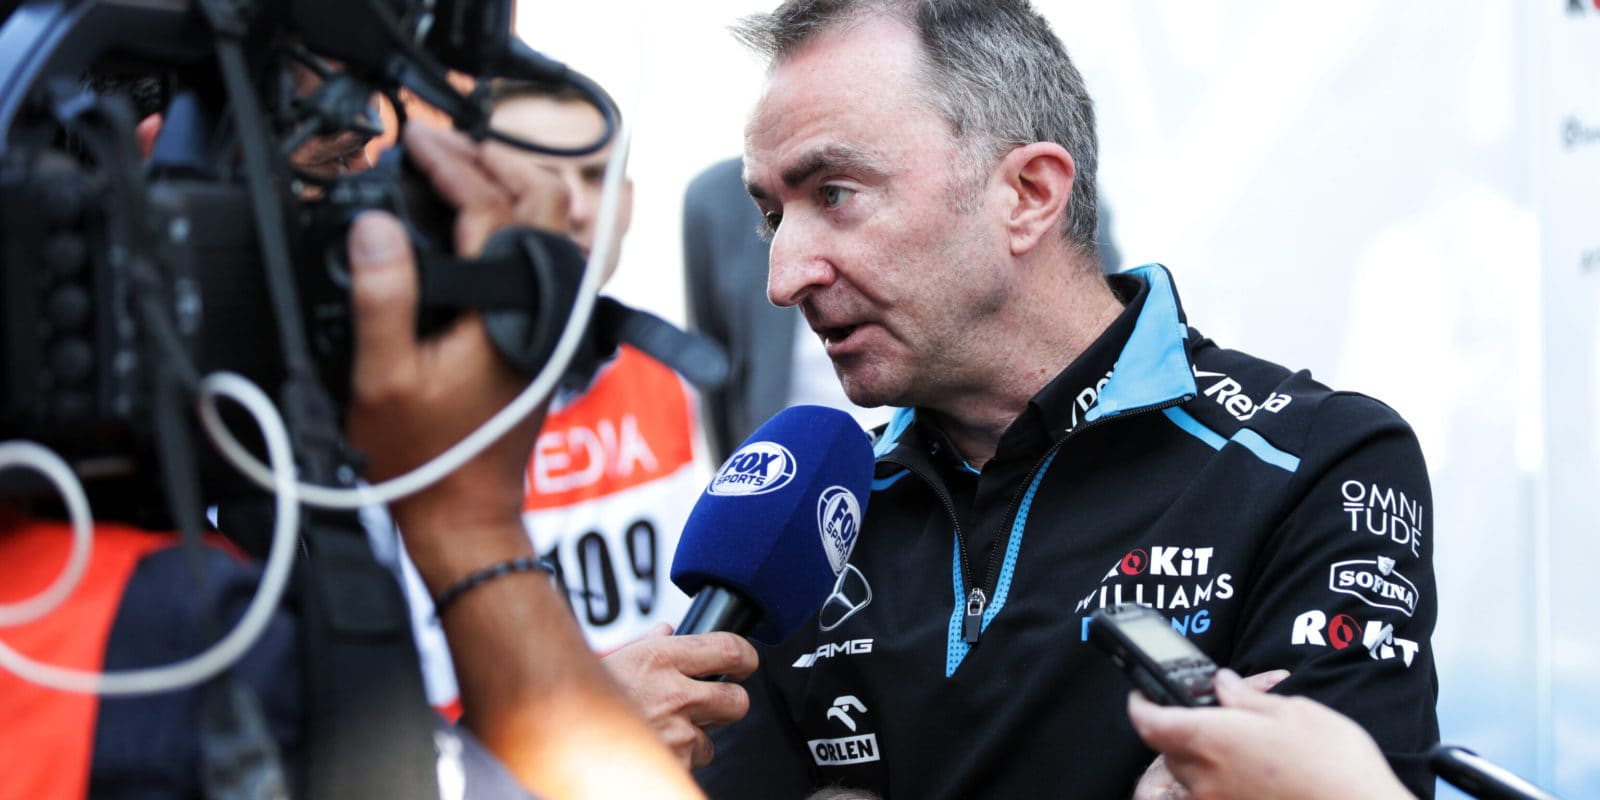 Paddy Lowe opustil pozici technického ředitele Williamsu